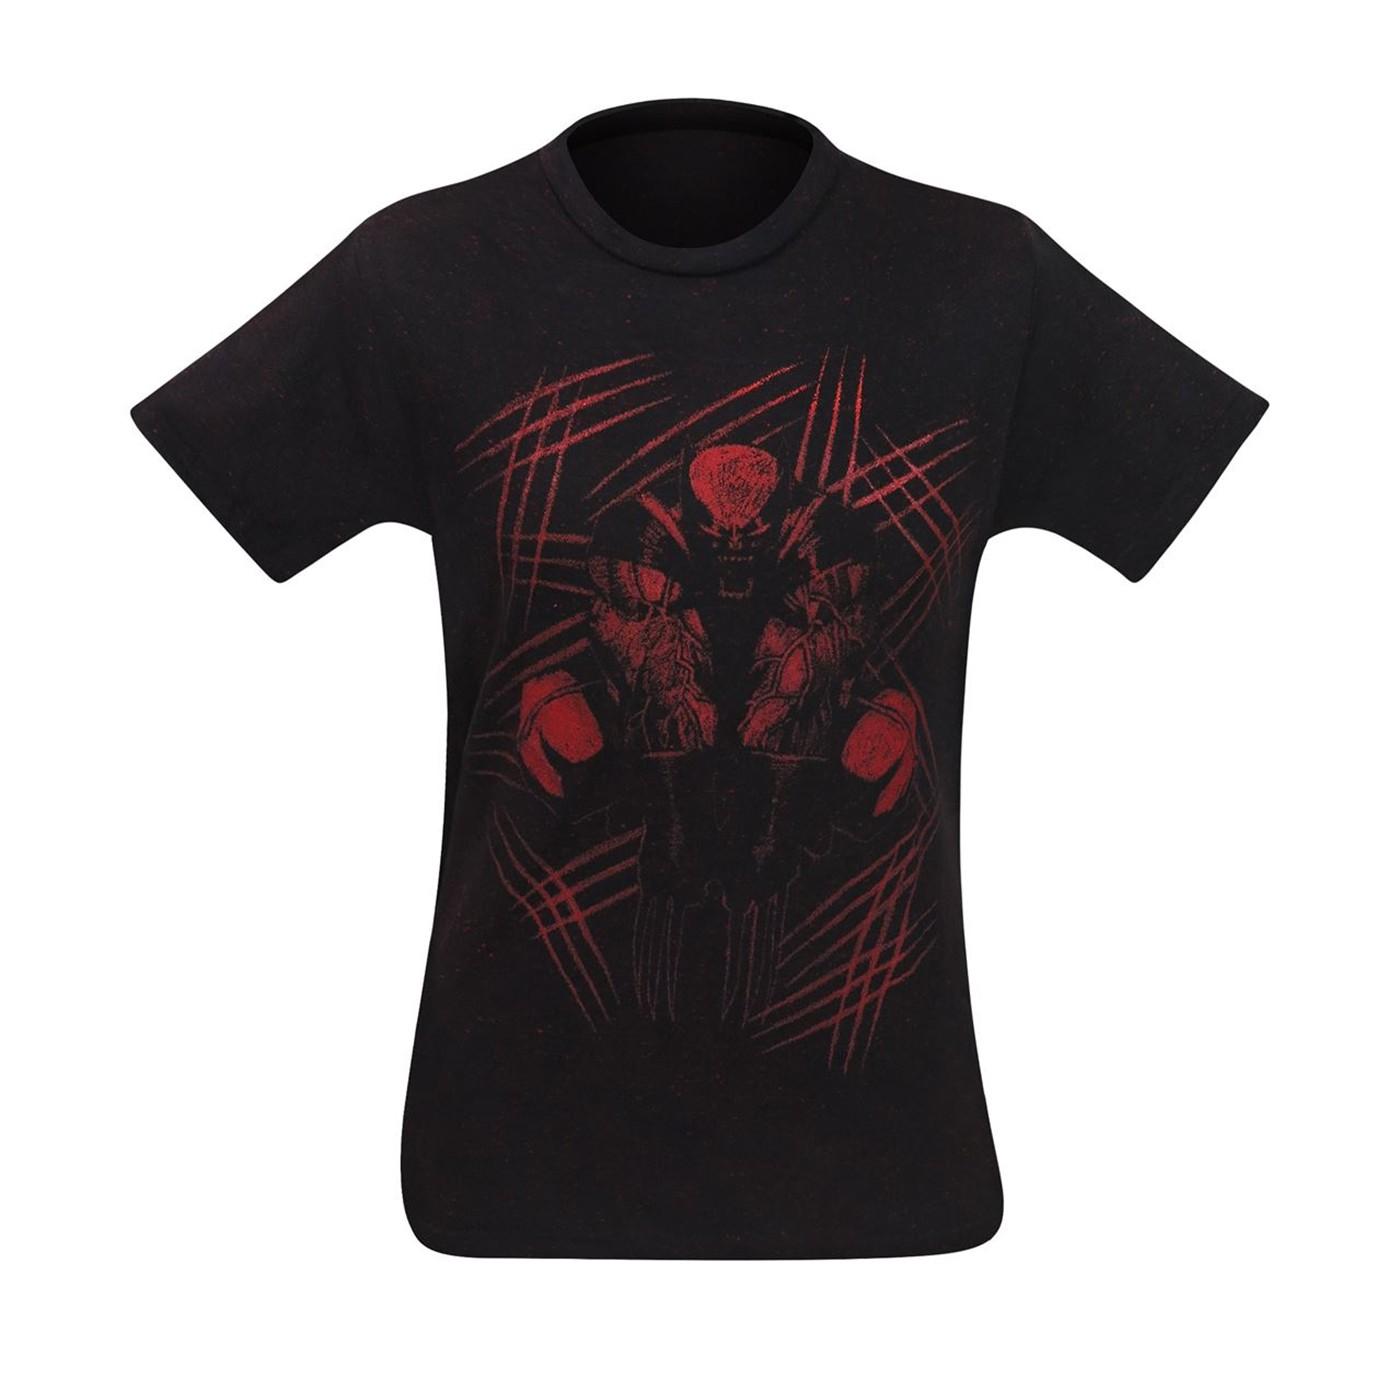 Wolverine Slash and Dash Men's T-Shirt